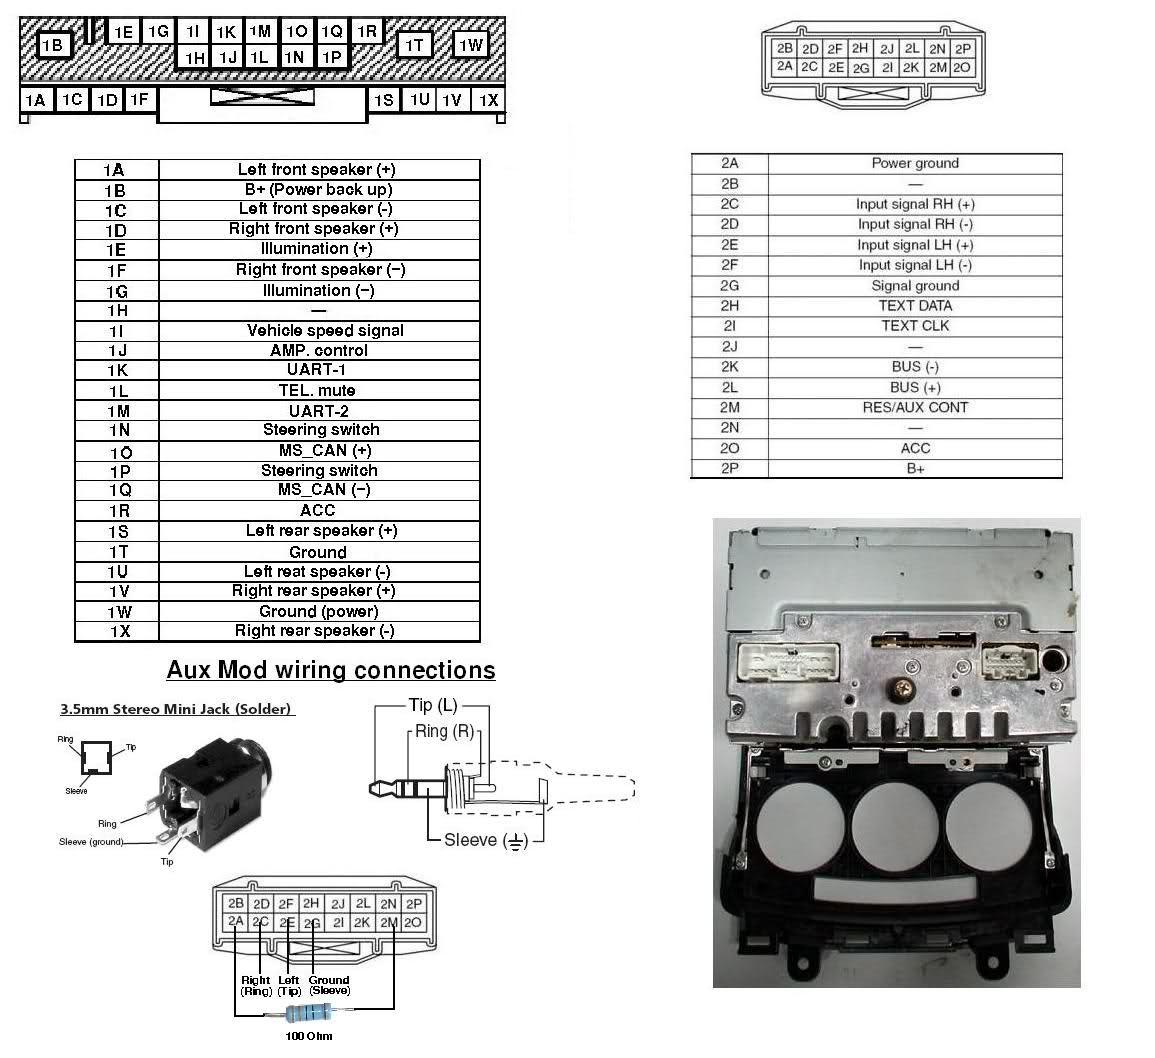 Mazda 3 Aux Input Wiring Diagram : Wiring diagram for mazda b get free